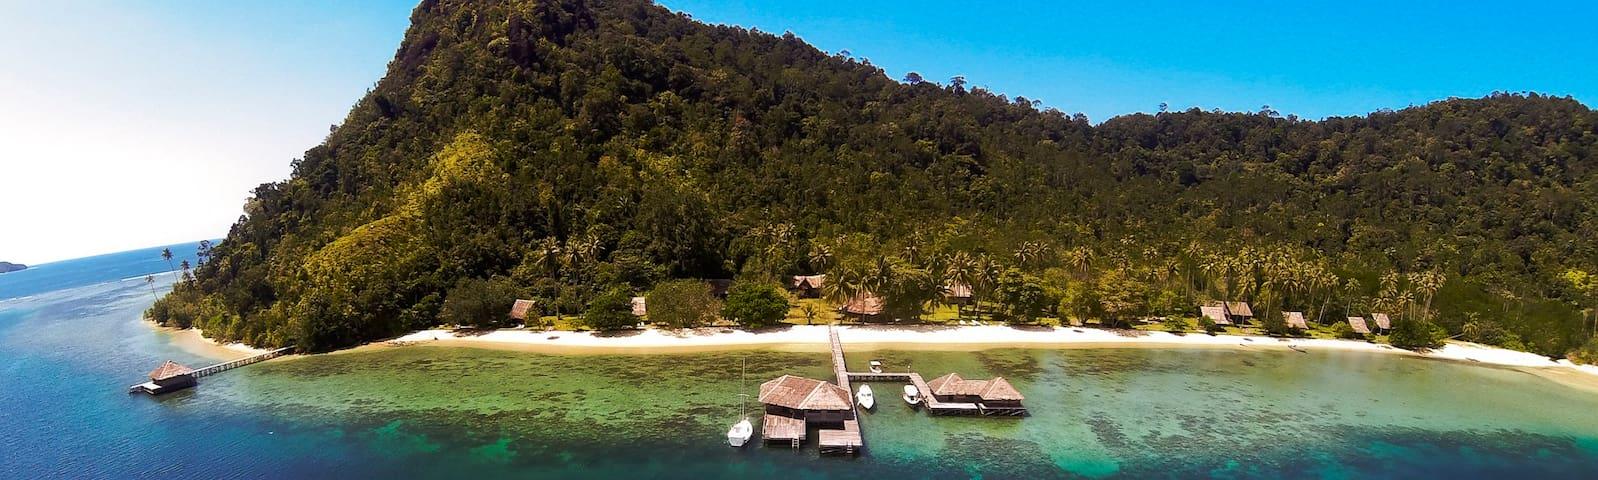 cubadak paradiso village Full board accommodation - Koto XI Tarusan - Doğa içinde pansiyon